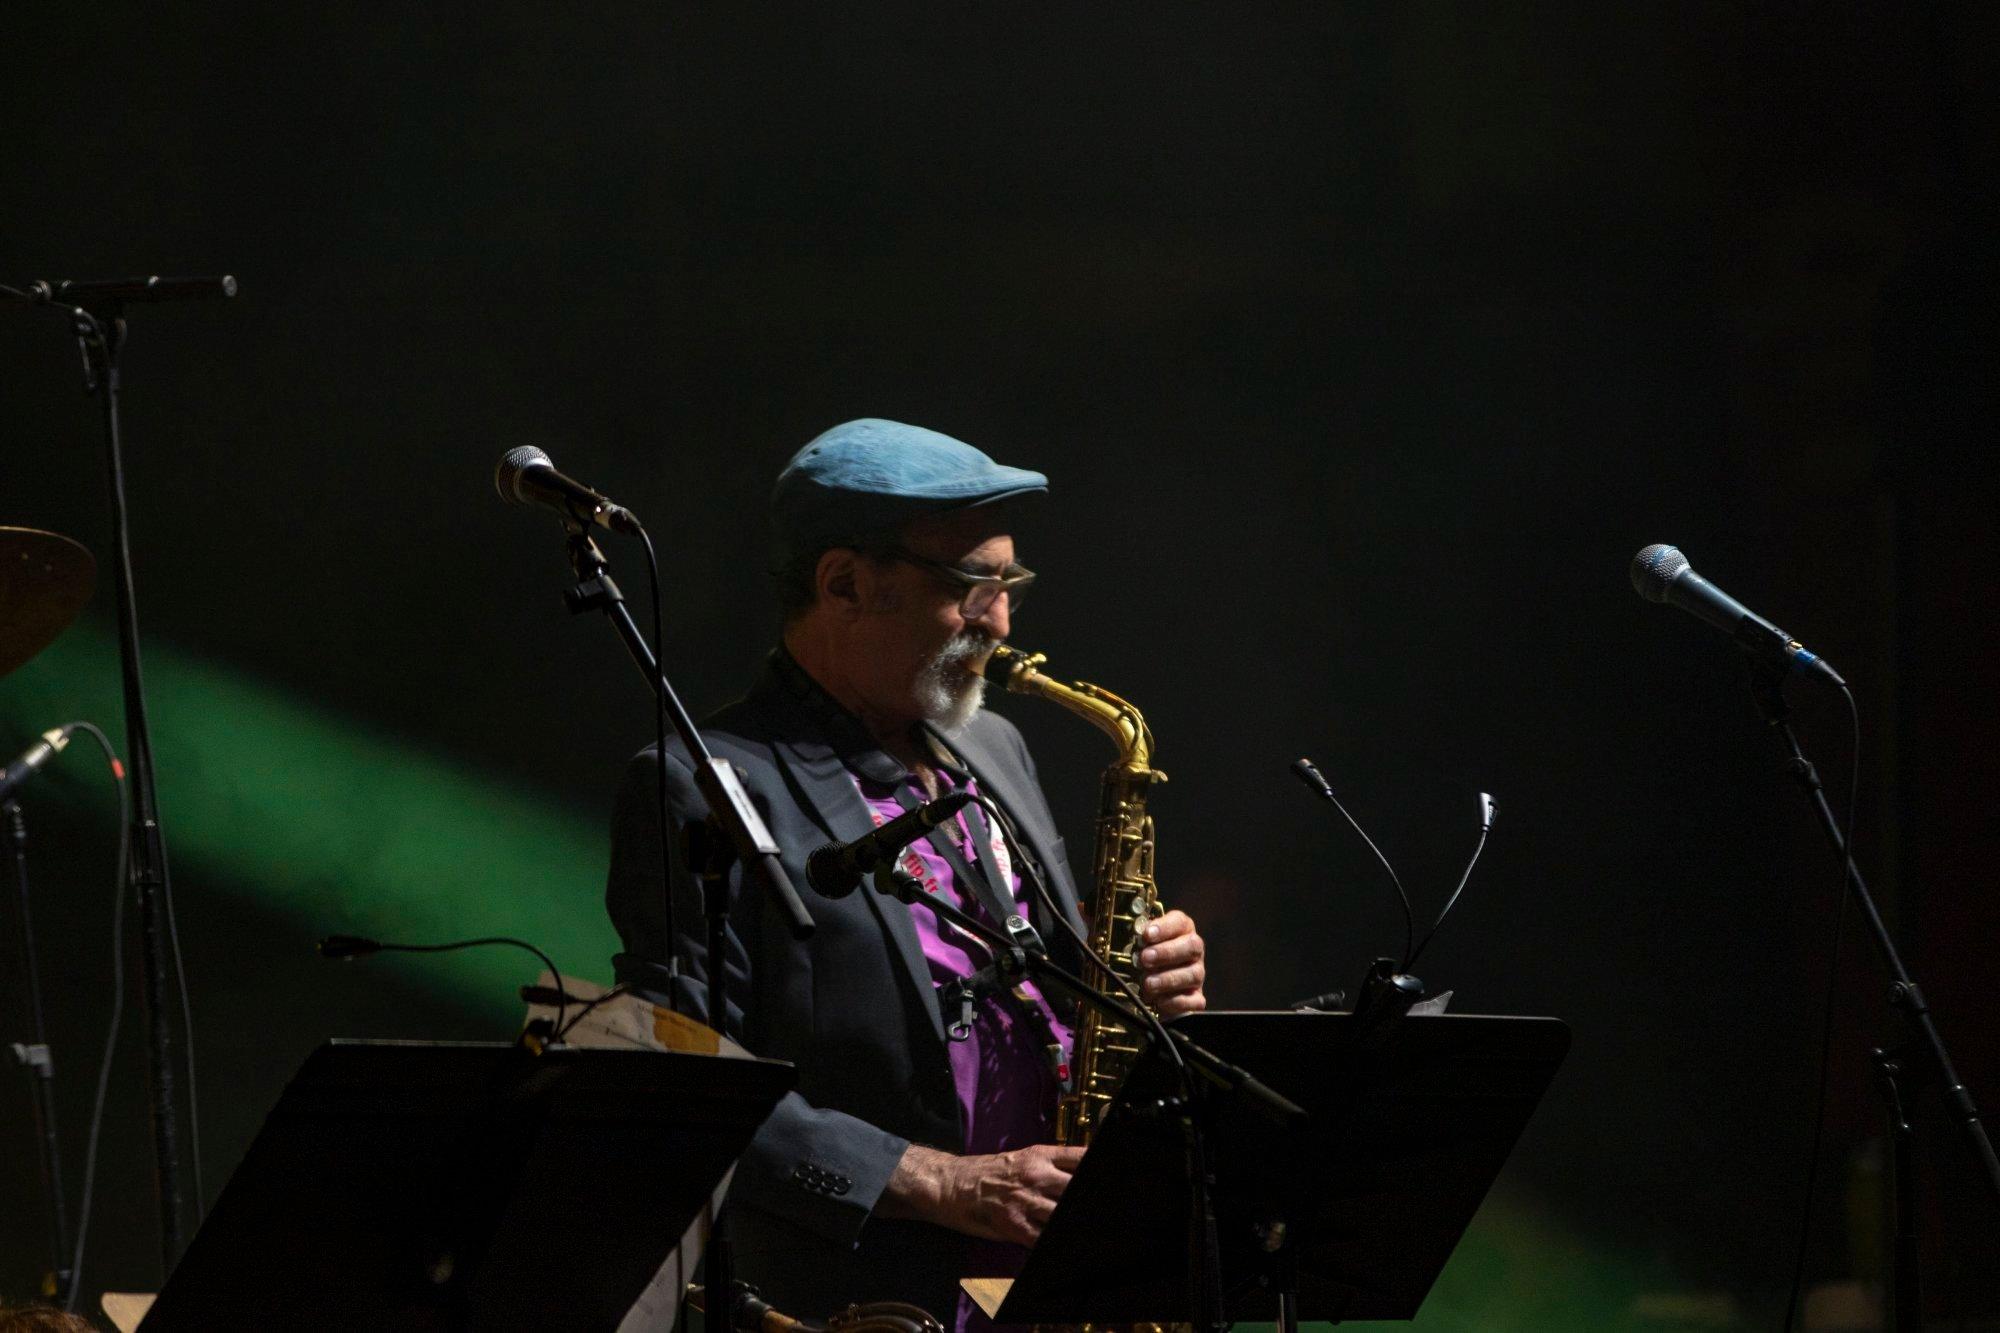 jazz-saxophone-vert-noir-photographe-professionnel